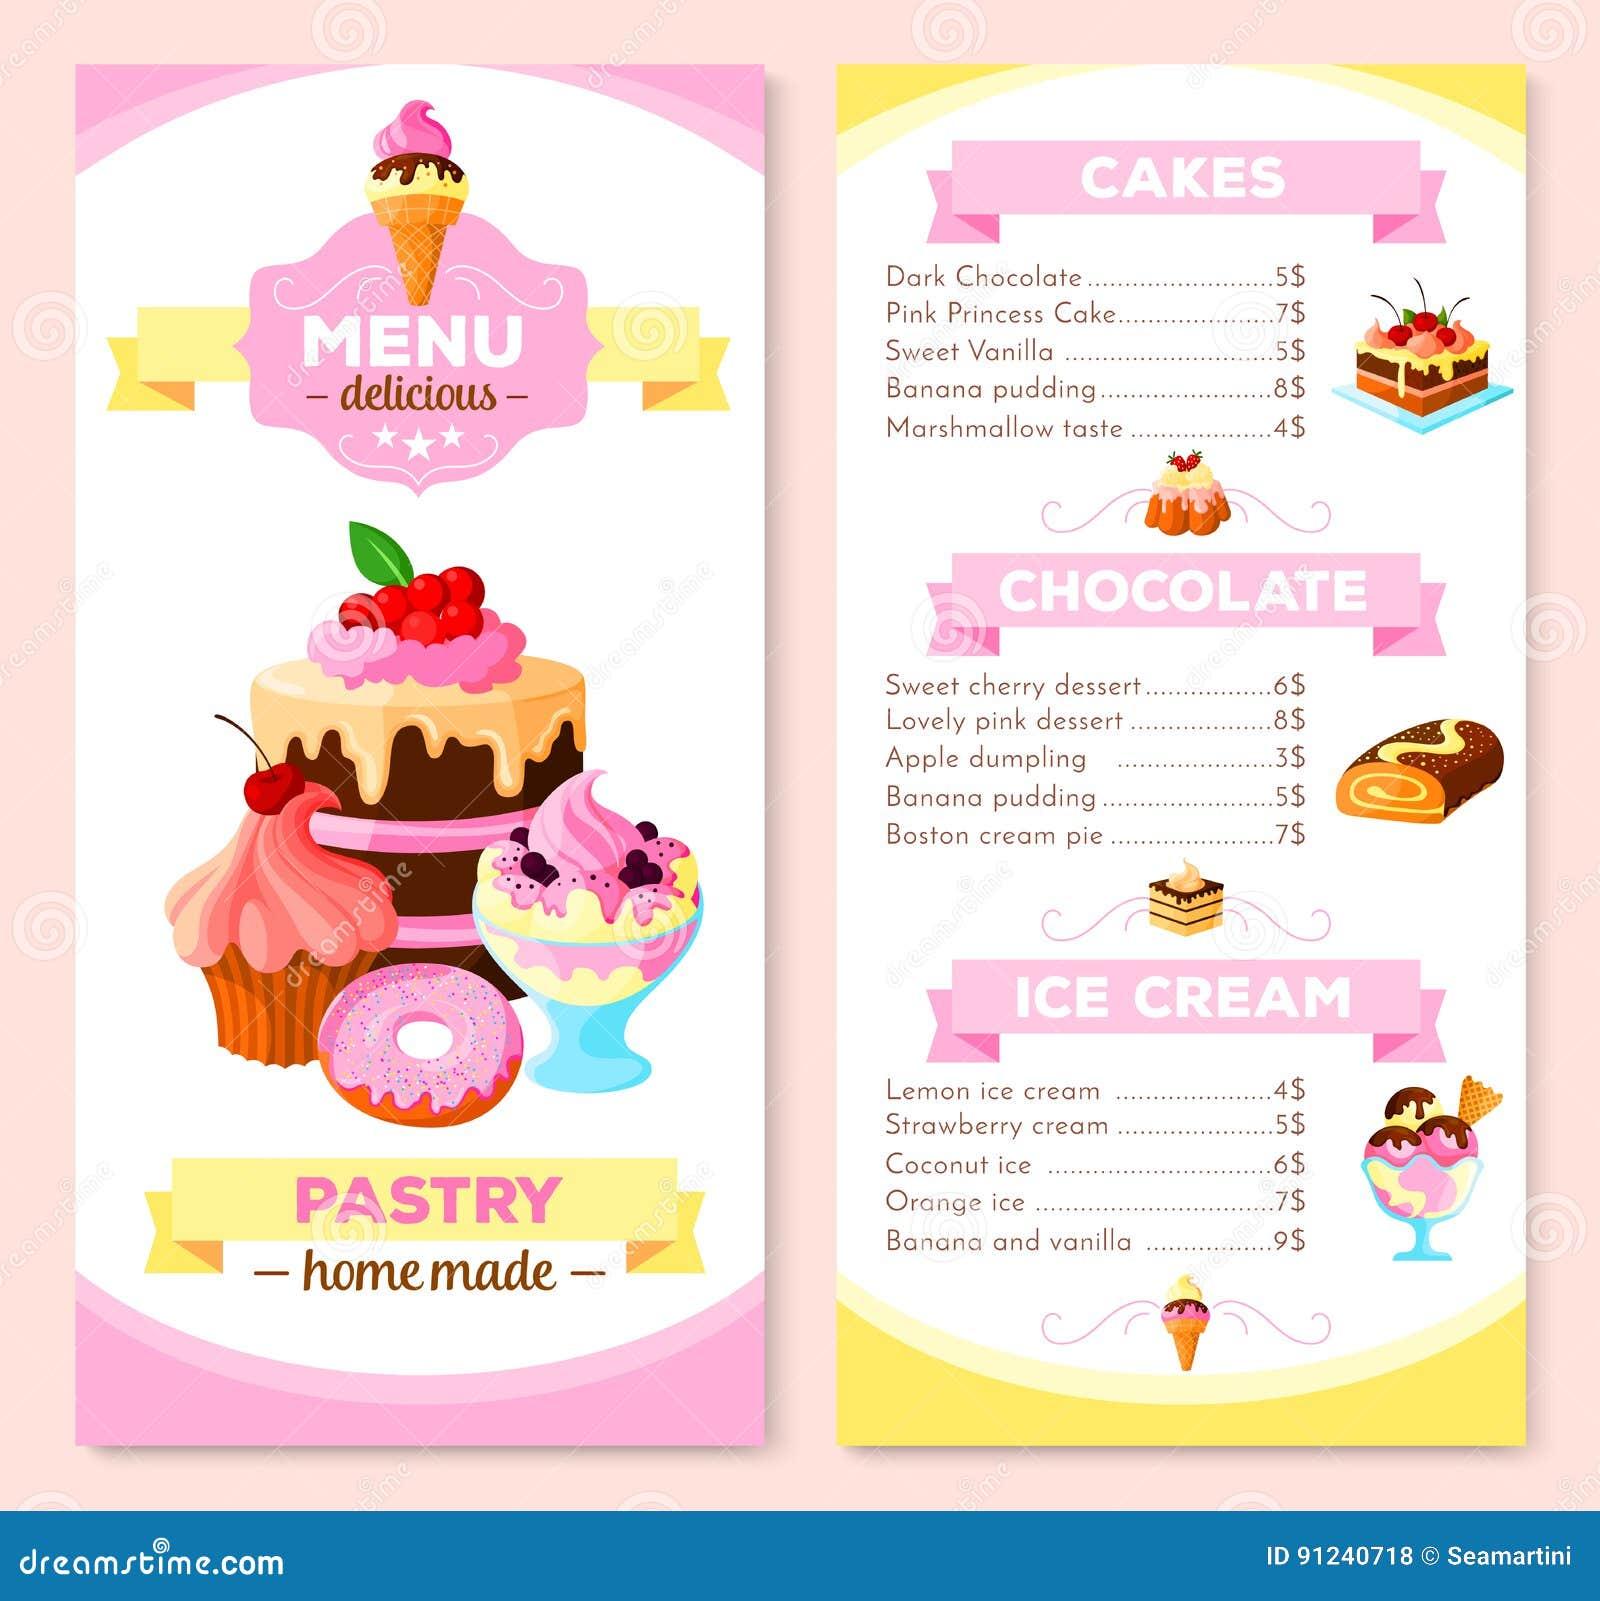 Cake Business Cards Uk